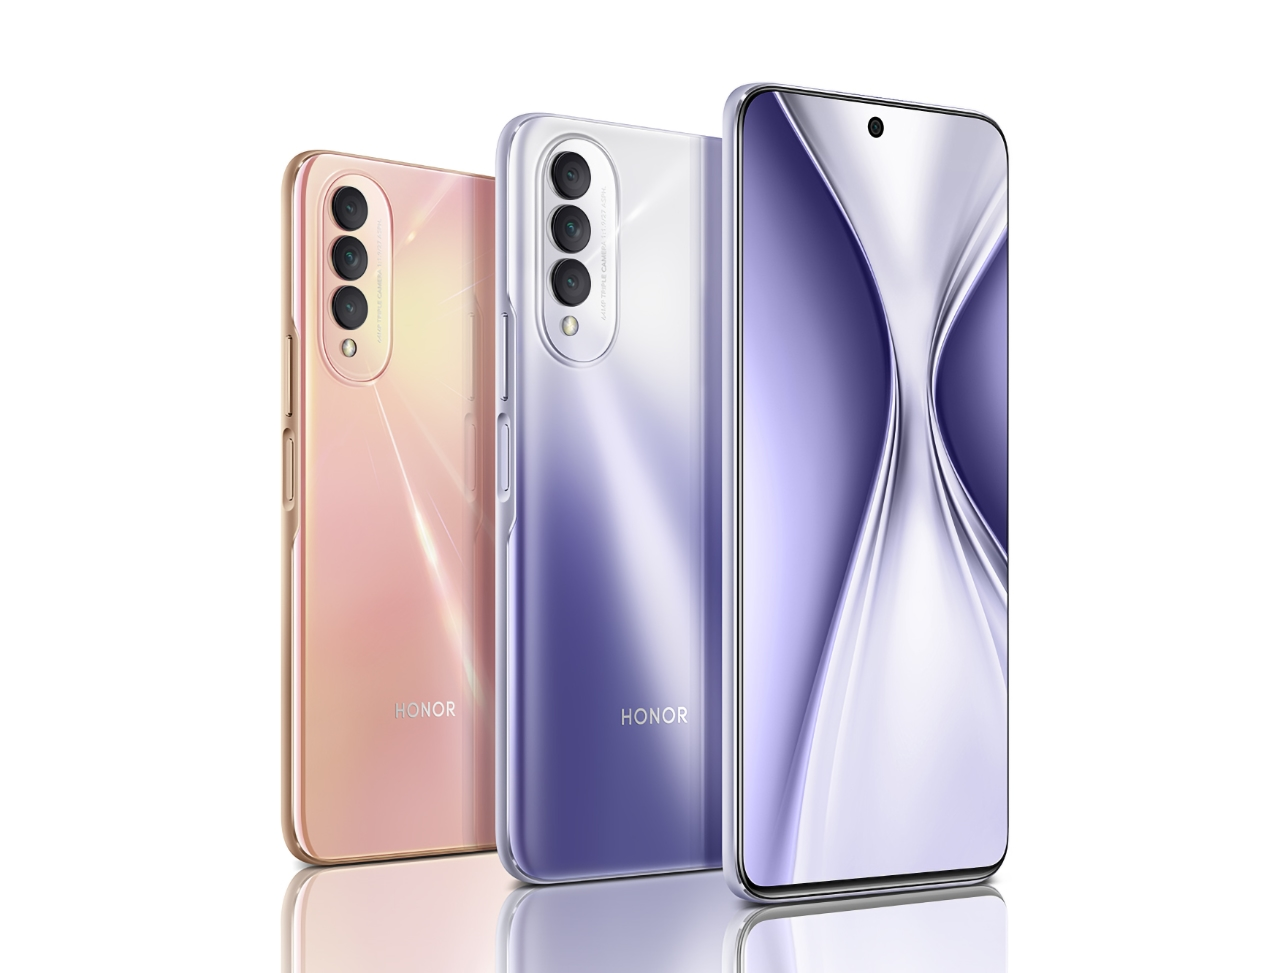 Honor X20 SE: смартфон с процессором MediaTek Dimensity 700 и тройной камерой на 64 МП за $278